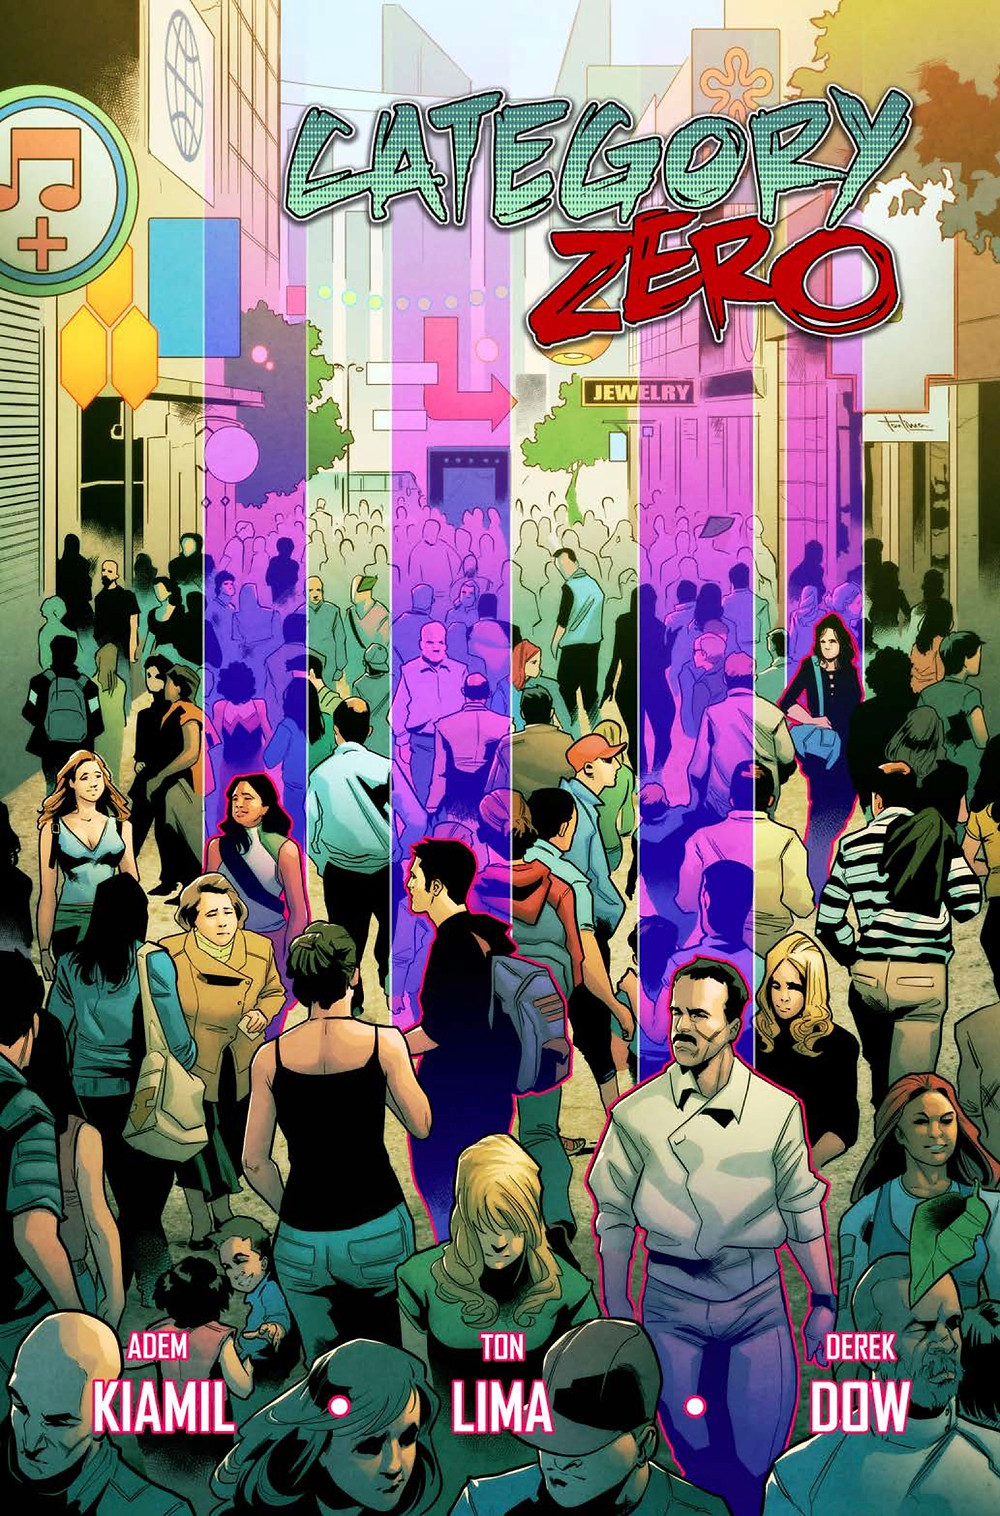 Category Zero, issue #1, cover, Scout Comics, Kiamil/Lima